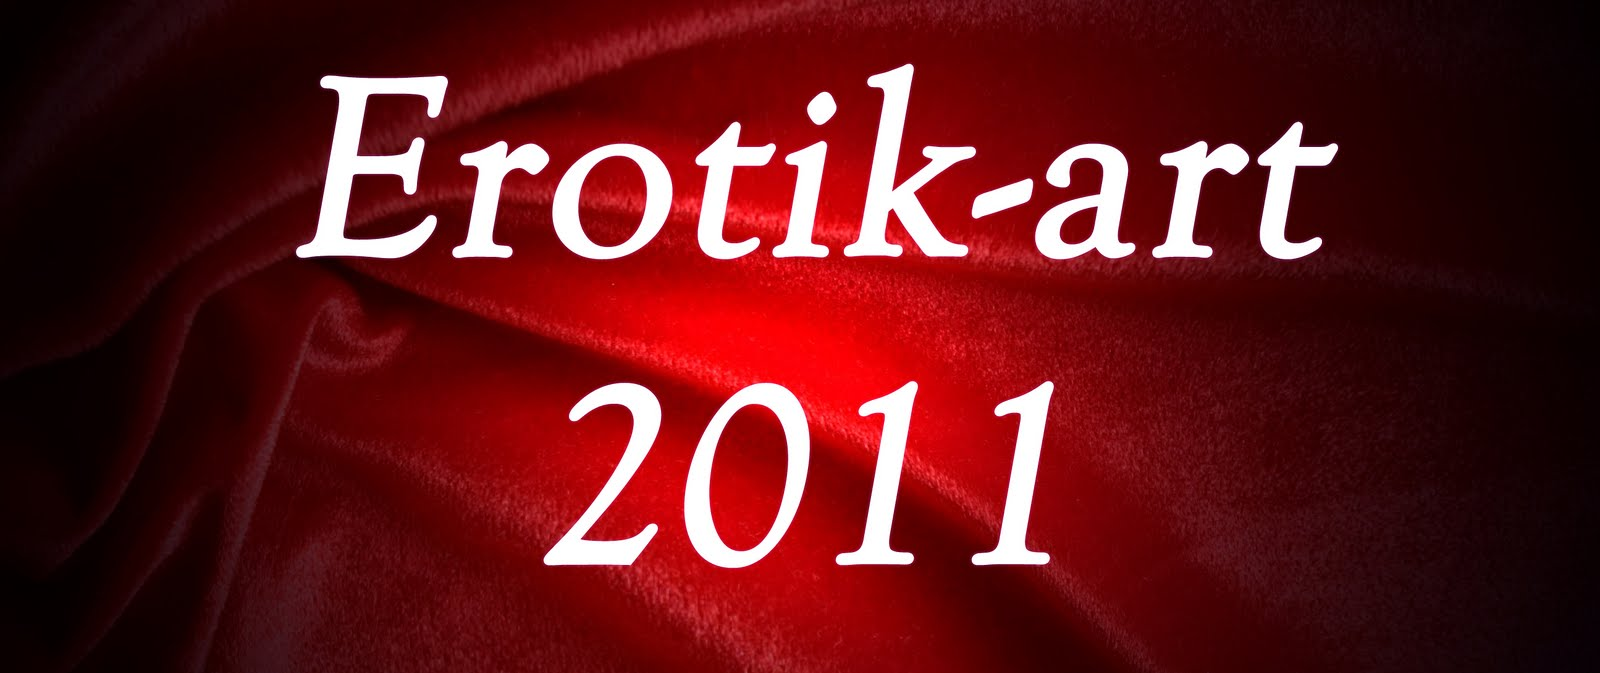 Erotik-art 2011